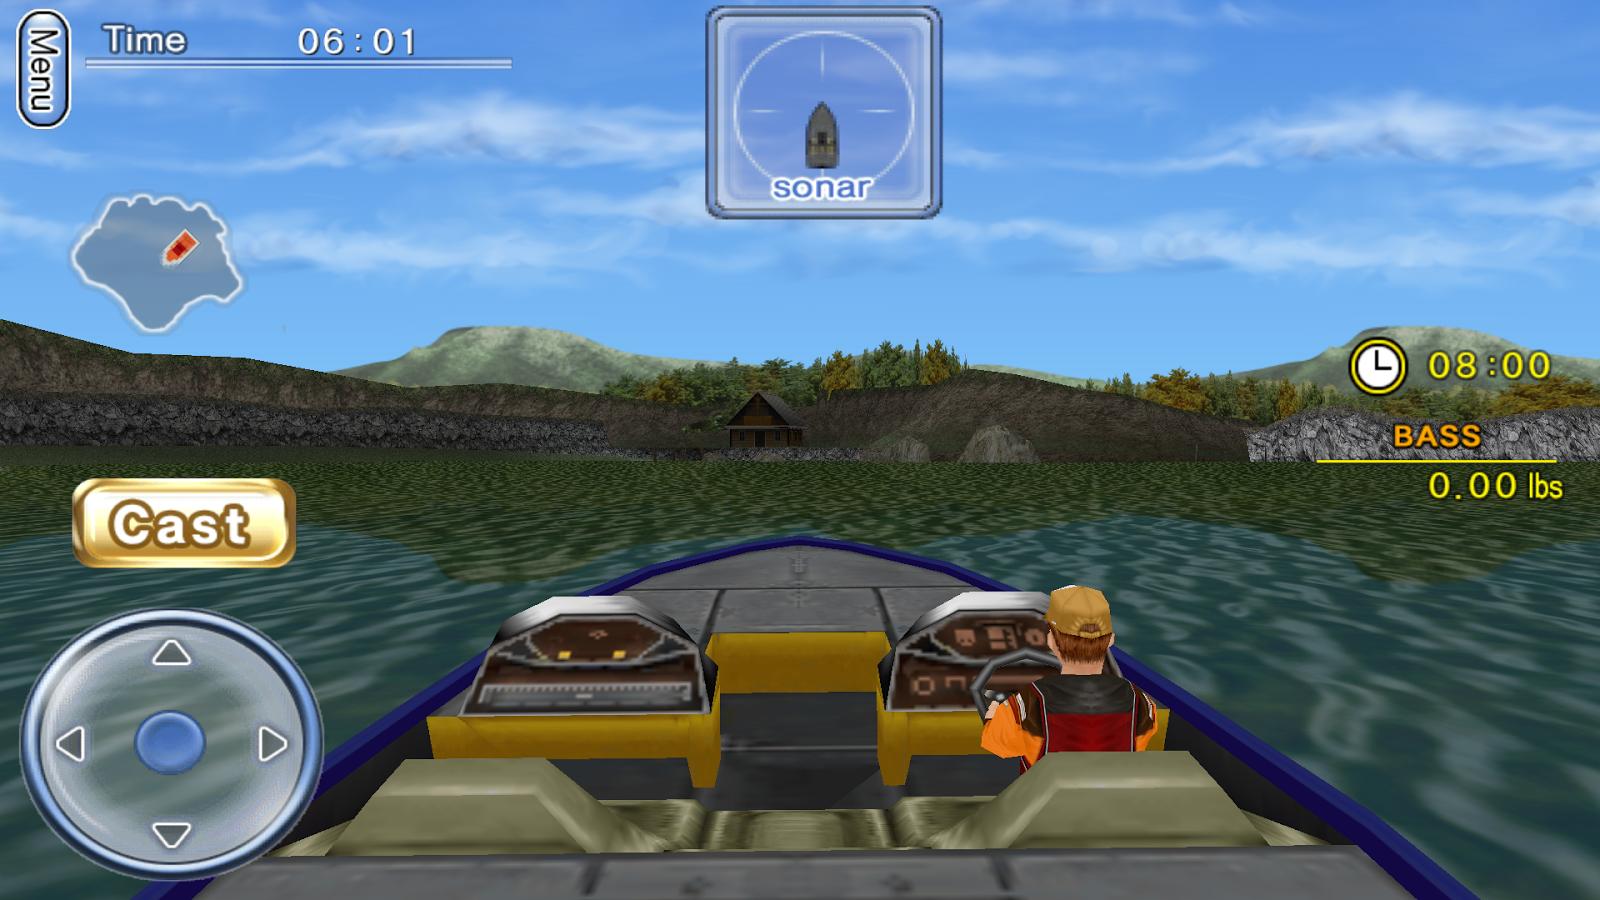 Bass Fishing 3D on the Boat - screenshot